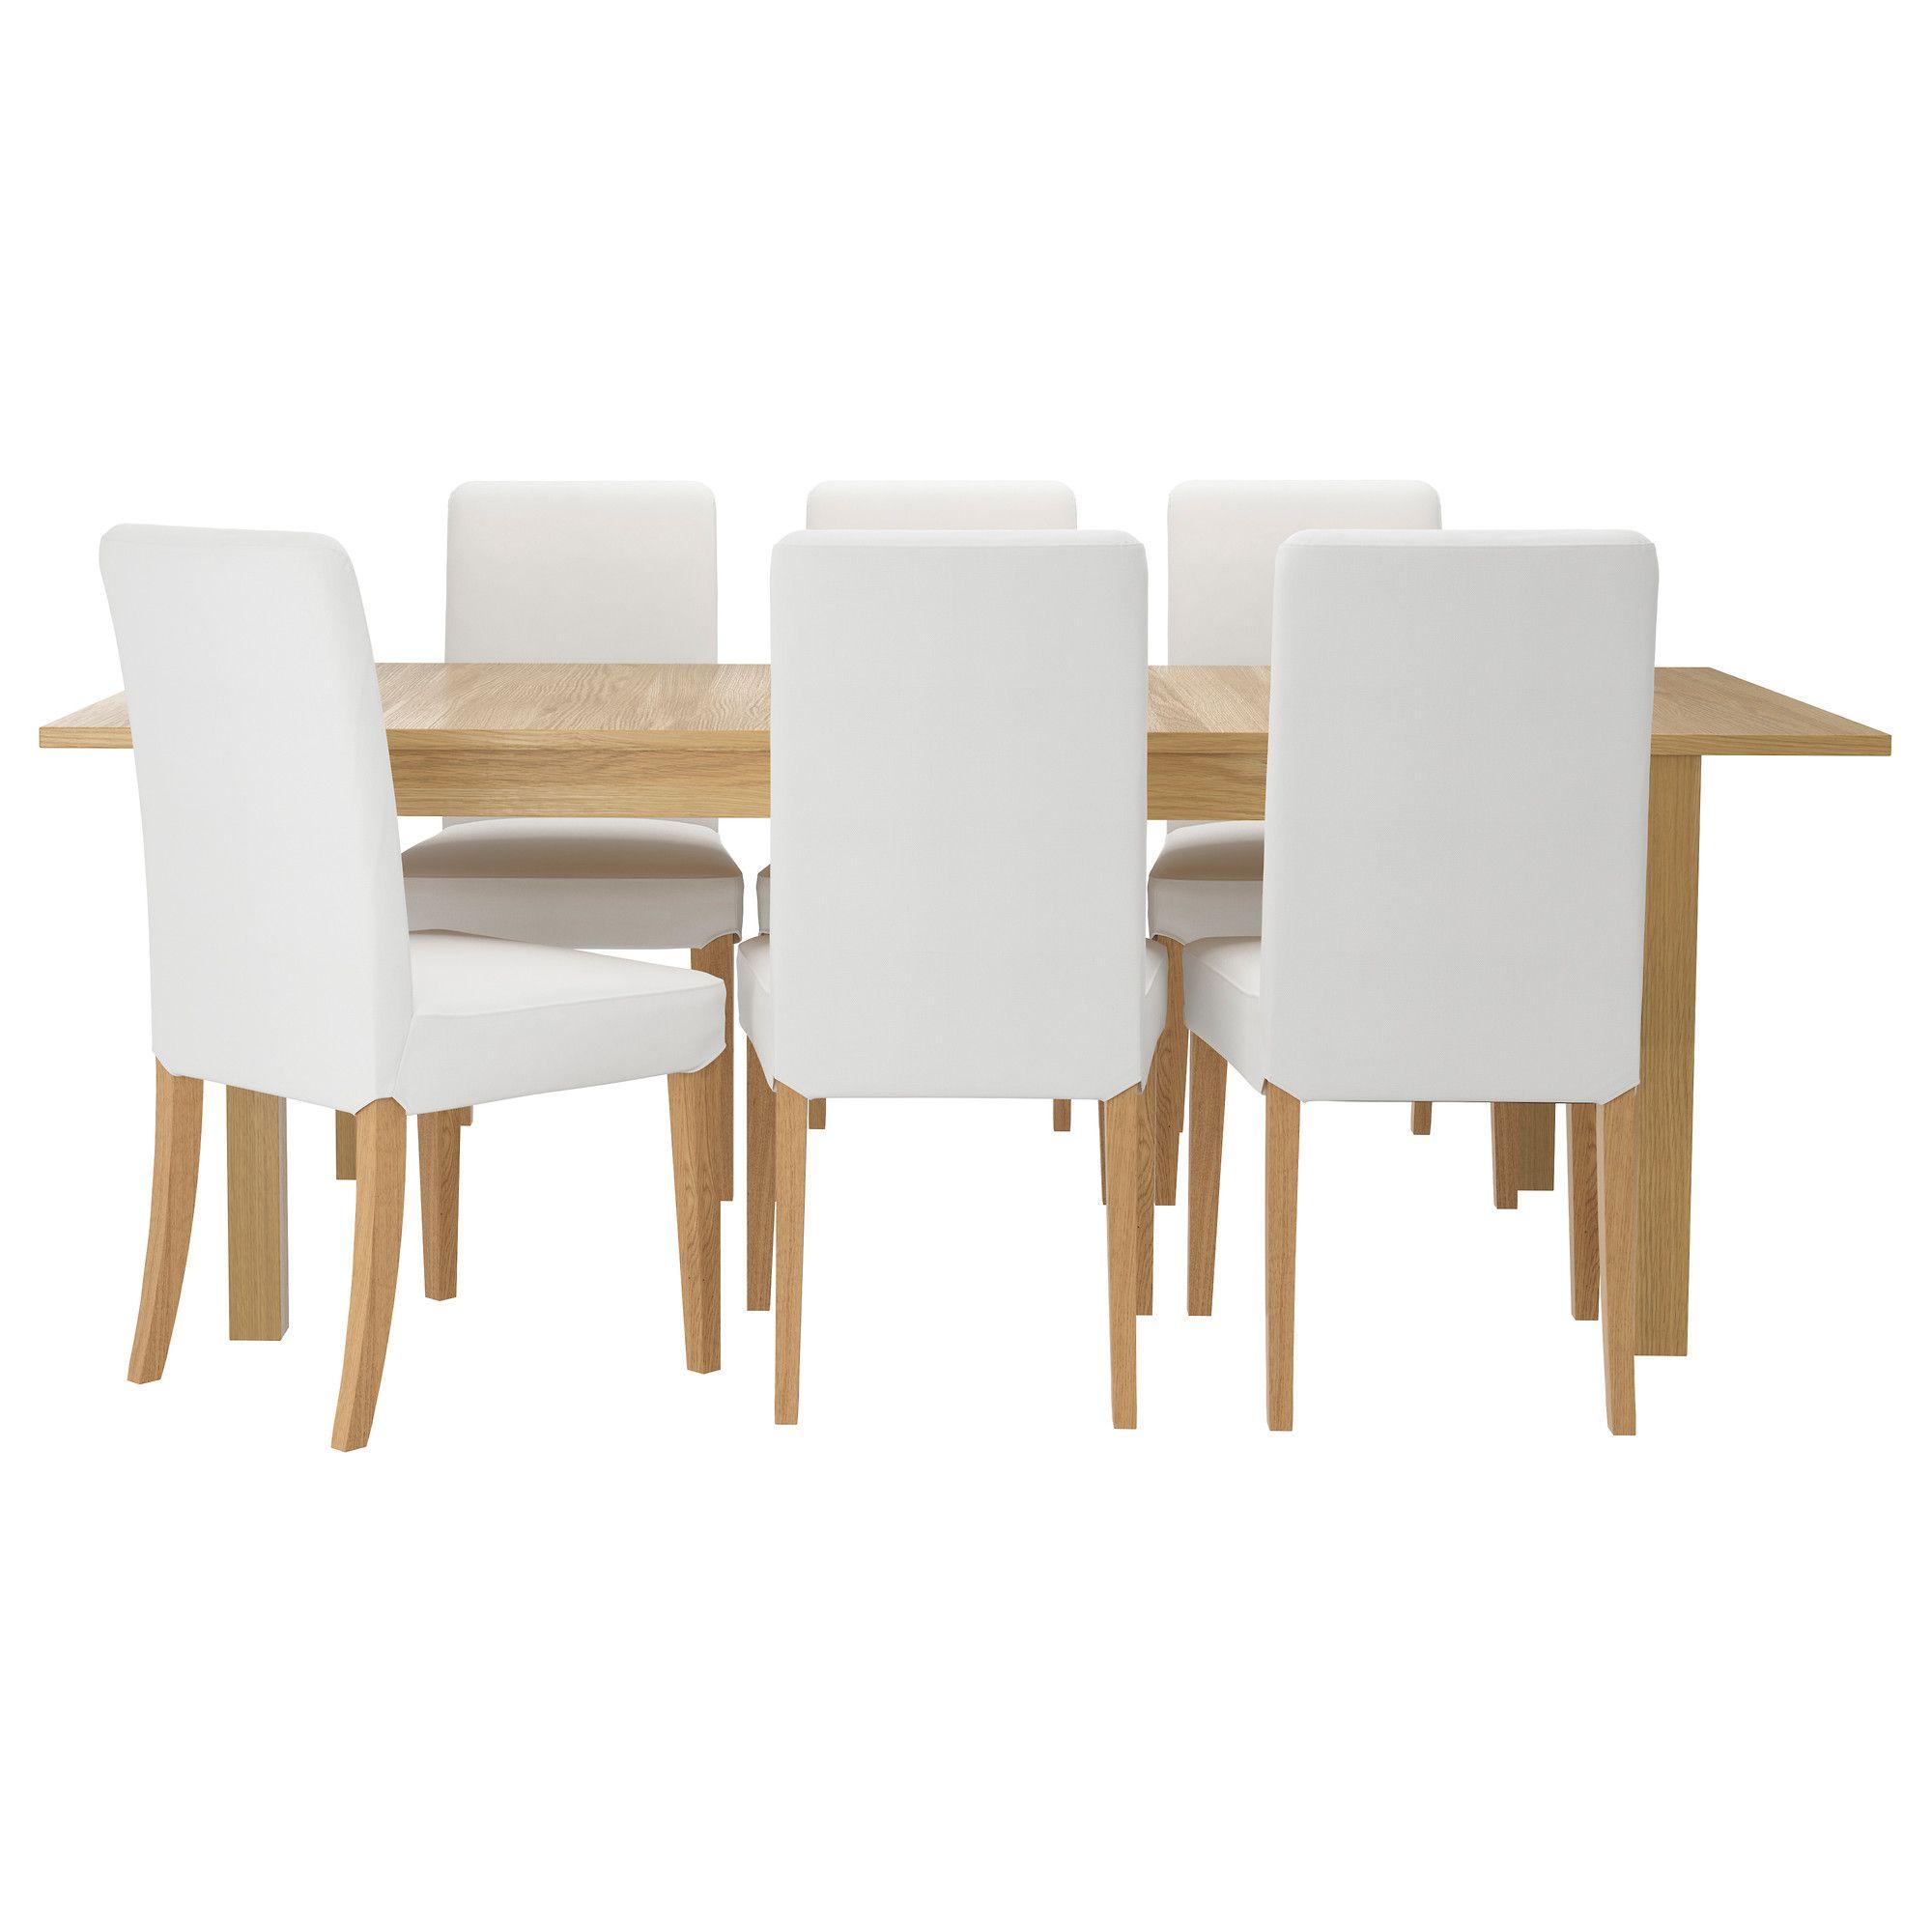 Tavolo Ikea Bjursta Bianco.Bjursta Henriksdal Tavolo E 6 Sedie Gobo Bianco Rovere